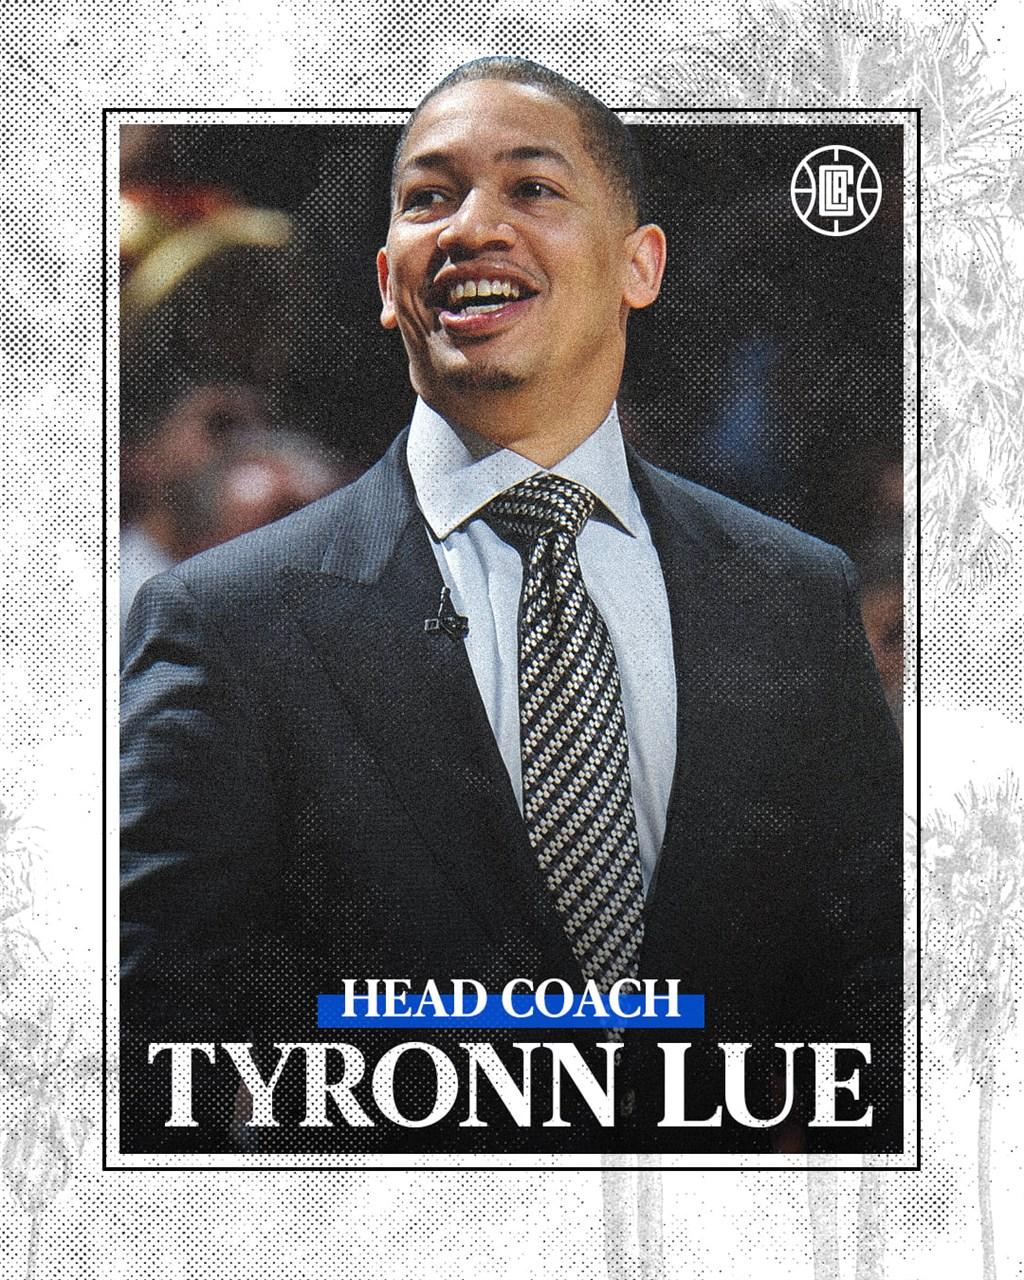 NBA洛杉磯快艇20日正式宣布泰隆.魯接任總教練,但未公布合約細節。(圖取自facebook.com/LAClippers)